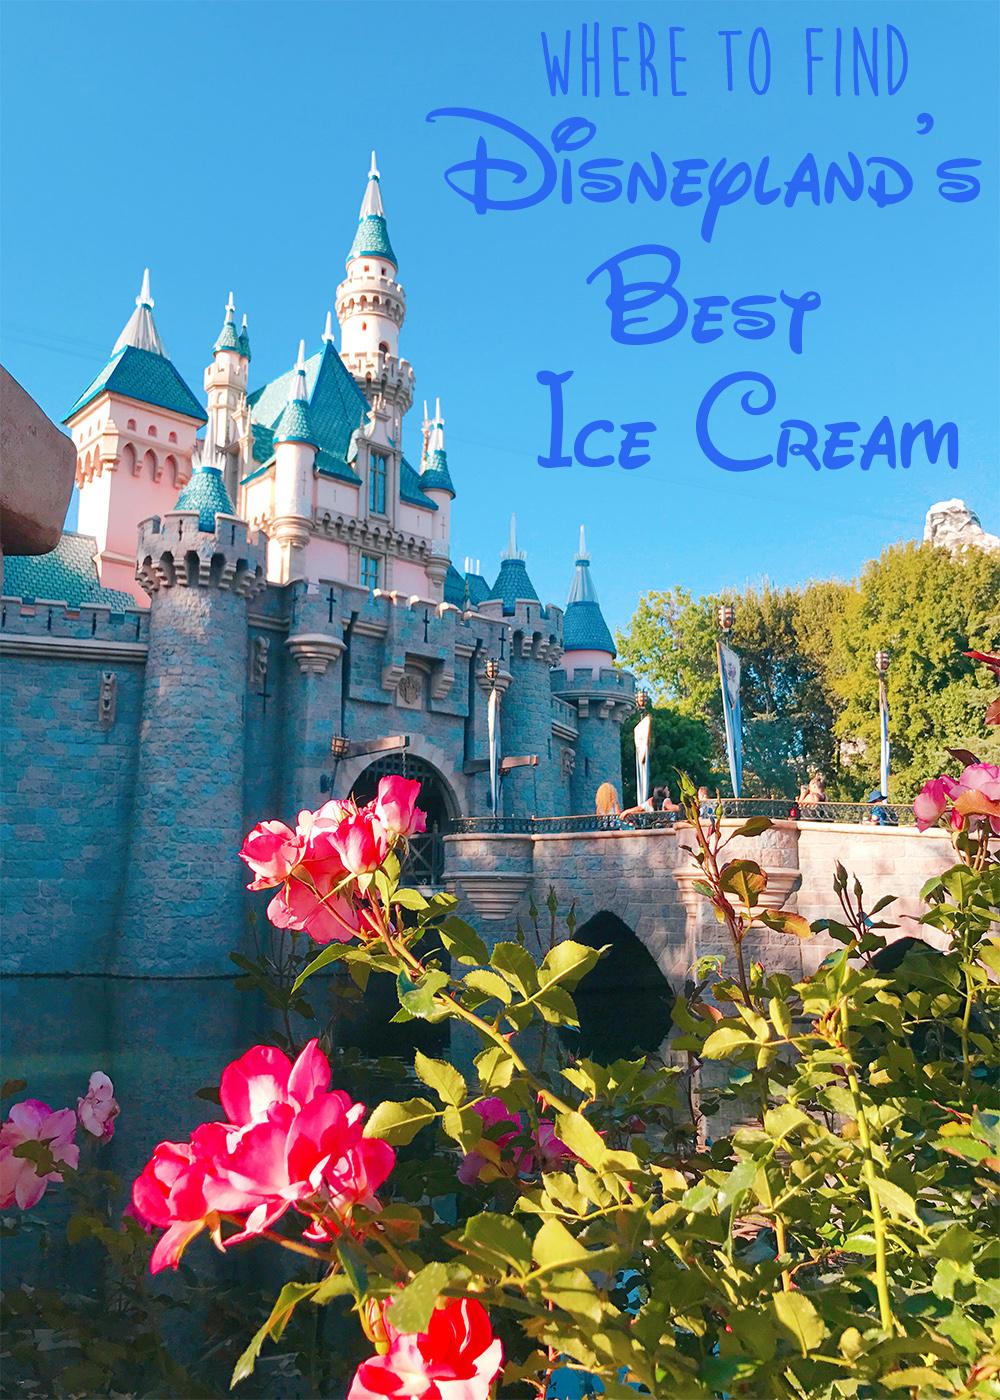 Best Disneyland Resort Ice Cream - Wandering Jokas Travel & Ice Cream Blog